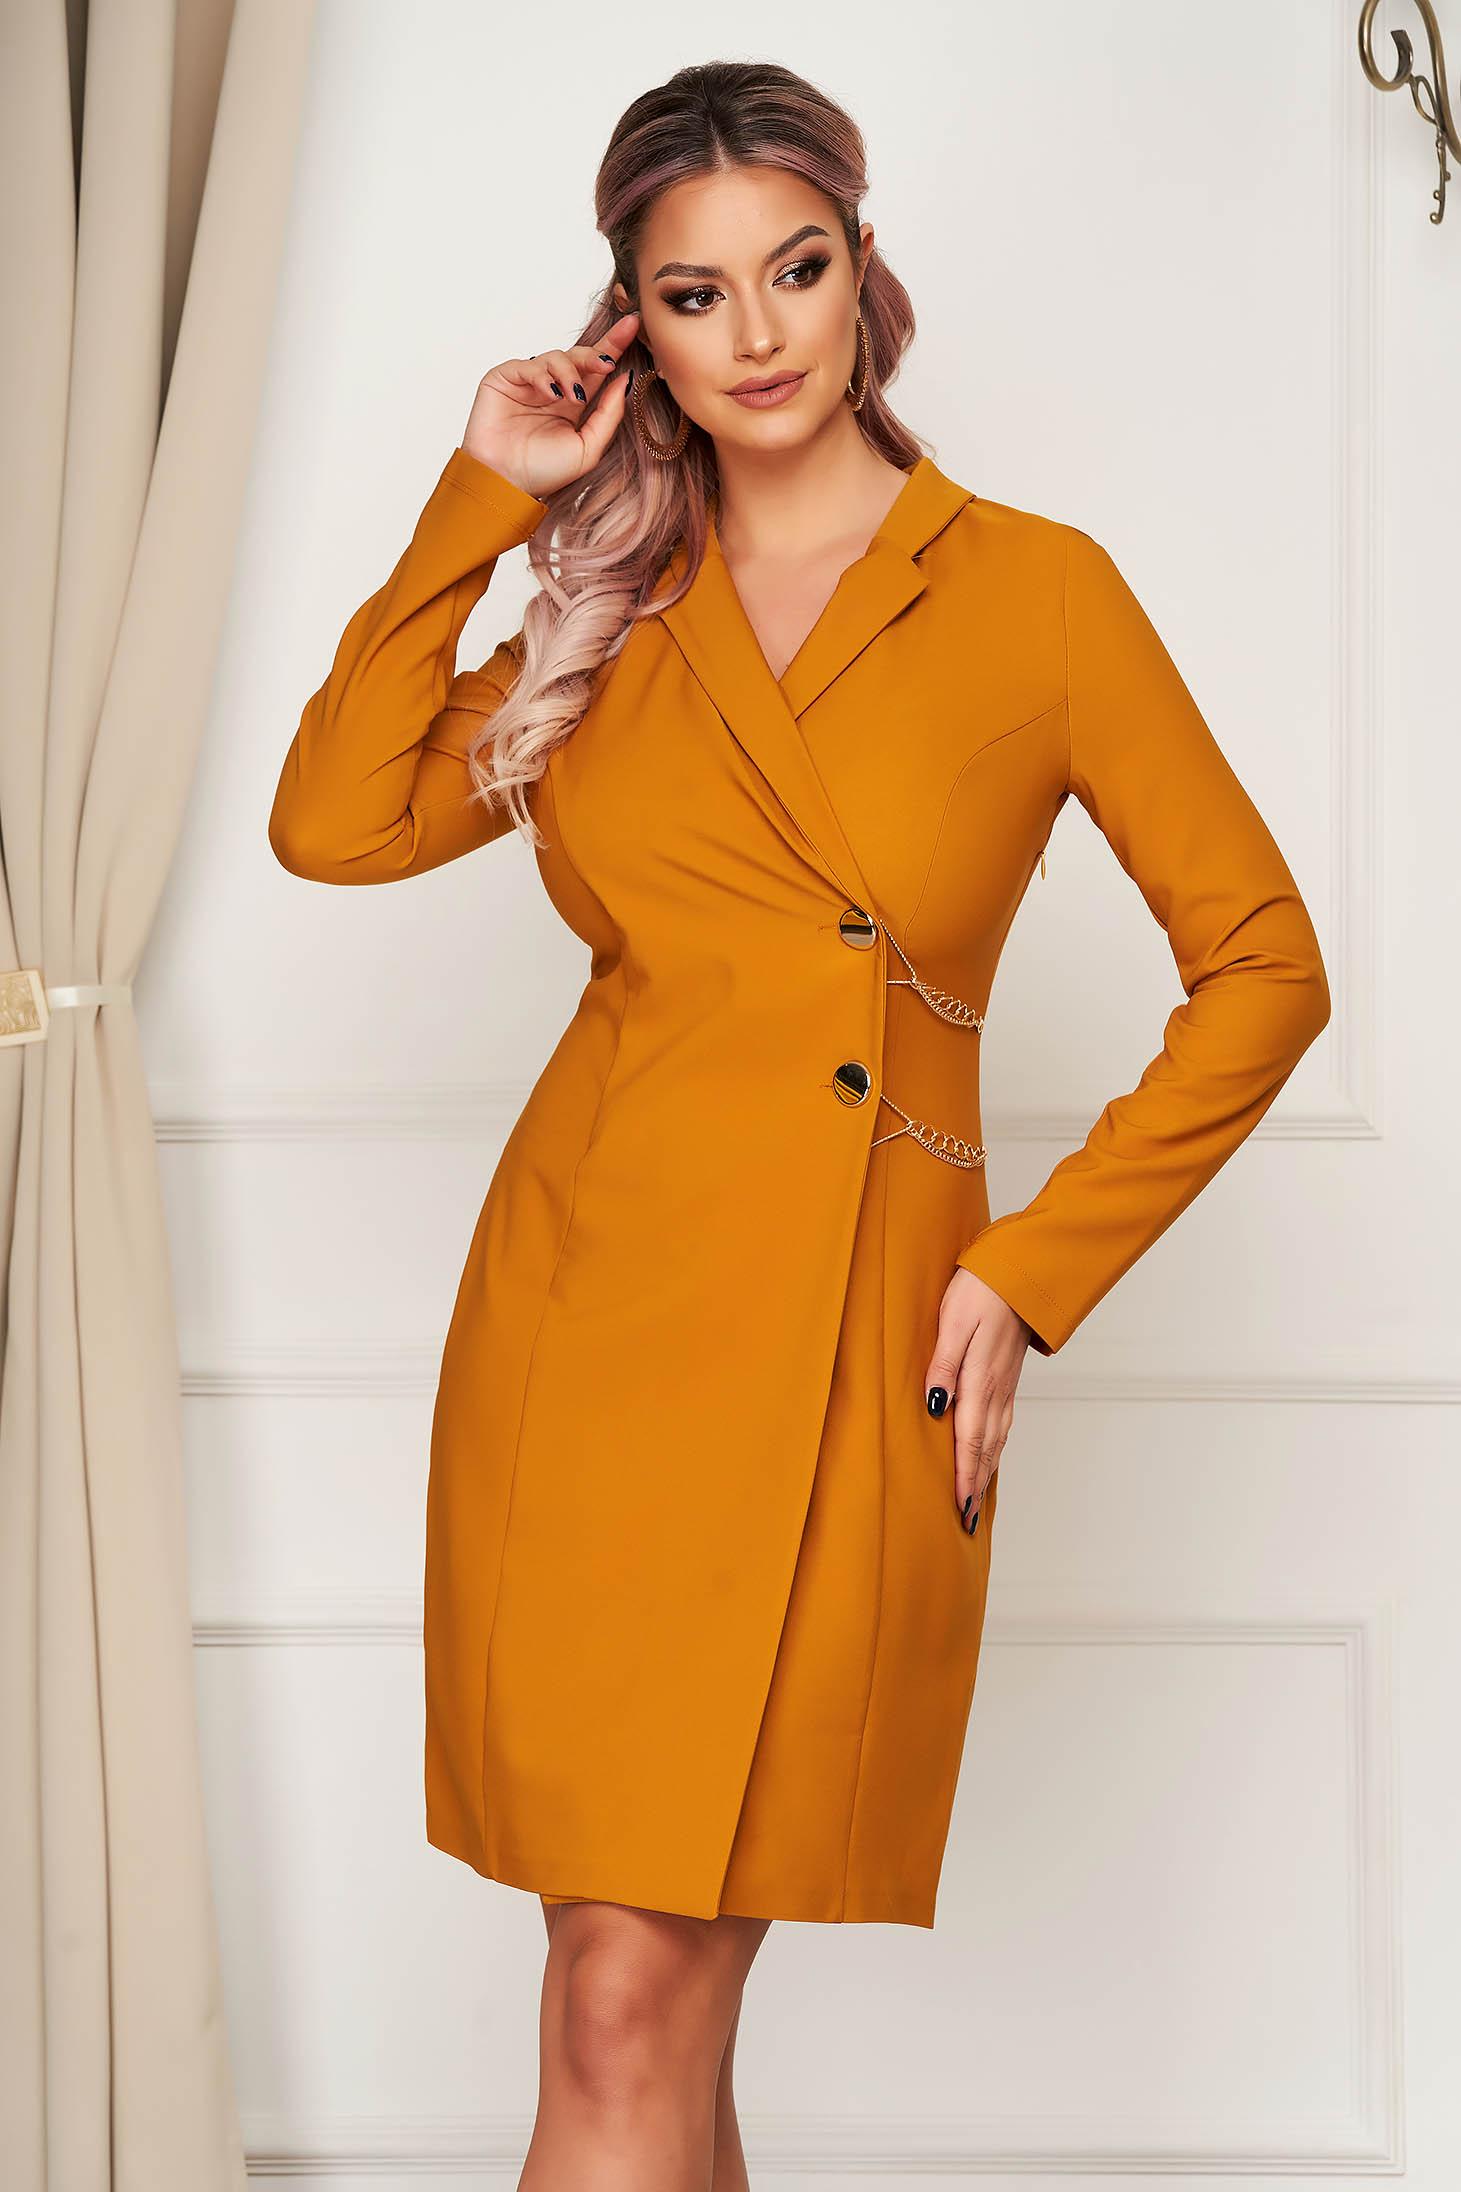 Mustard dress short cut daily blazer type a-line slightly elastic fabric